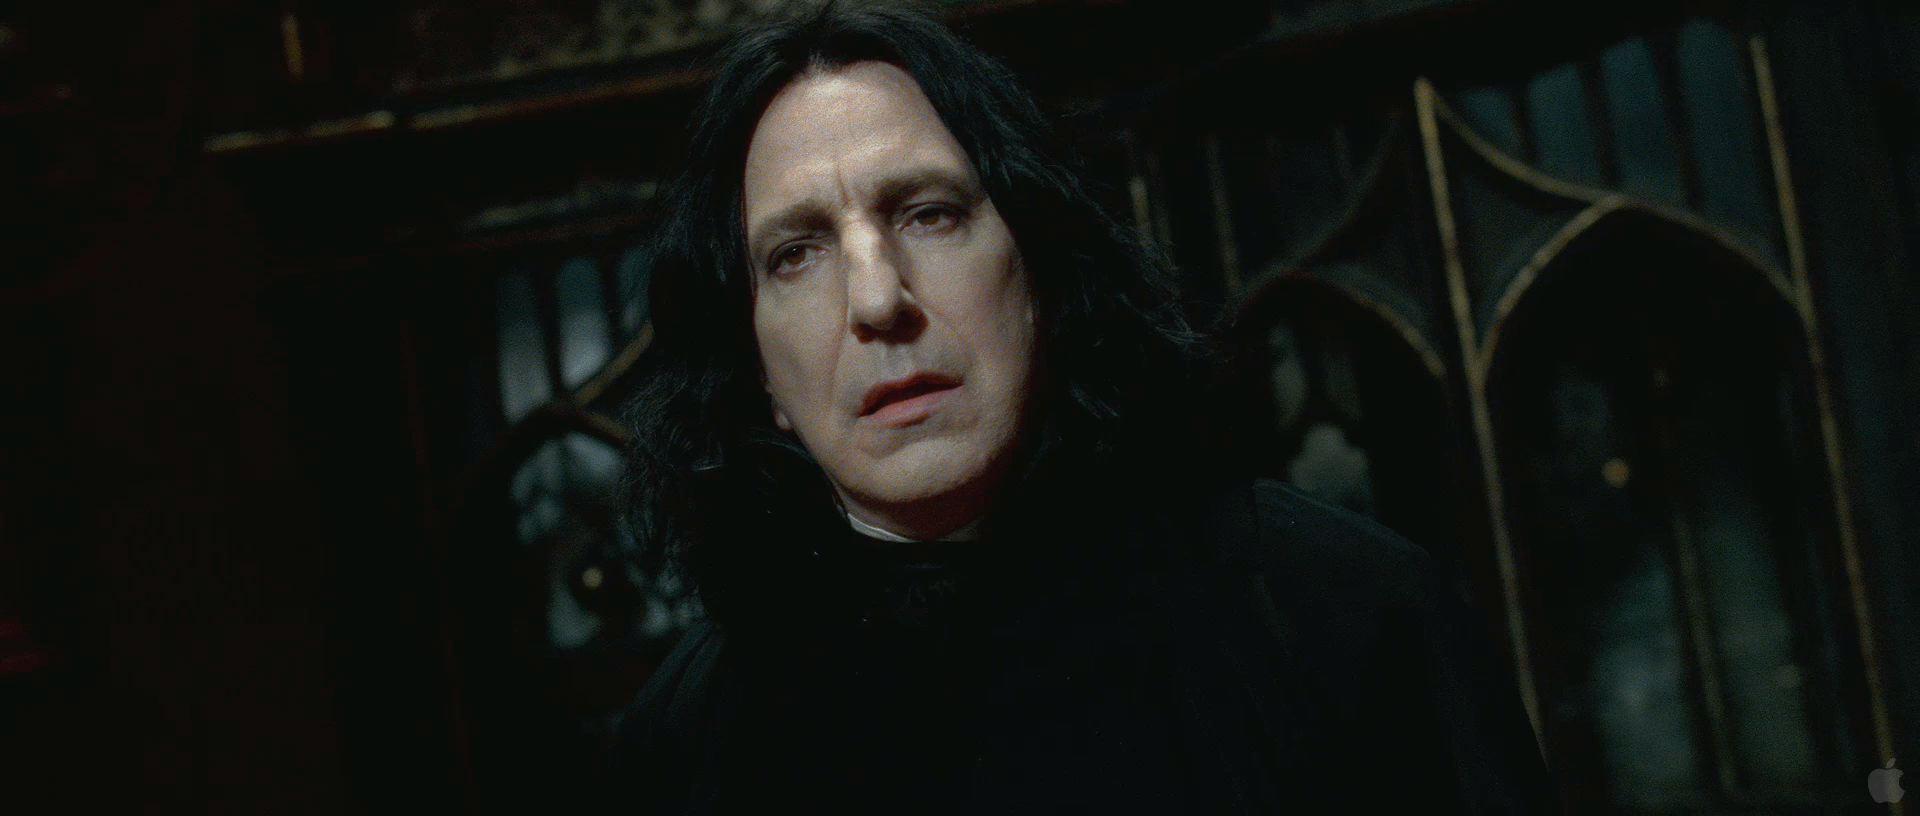 Harry Potter BlogHogwarts HP7 II Trailer 2 (8)